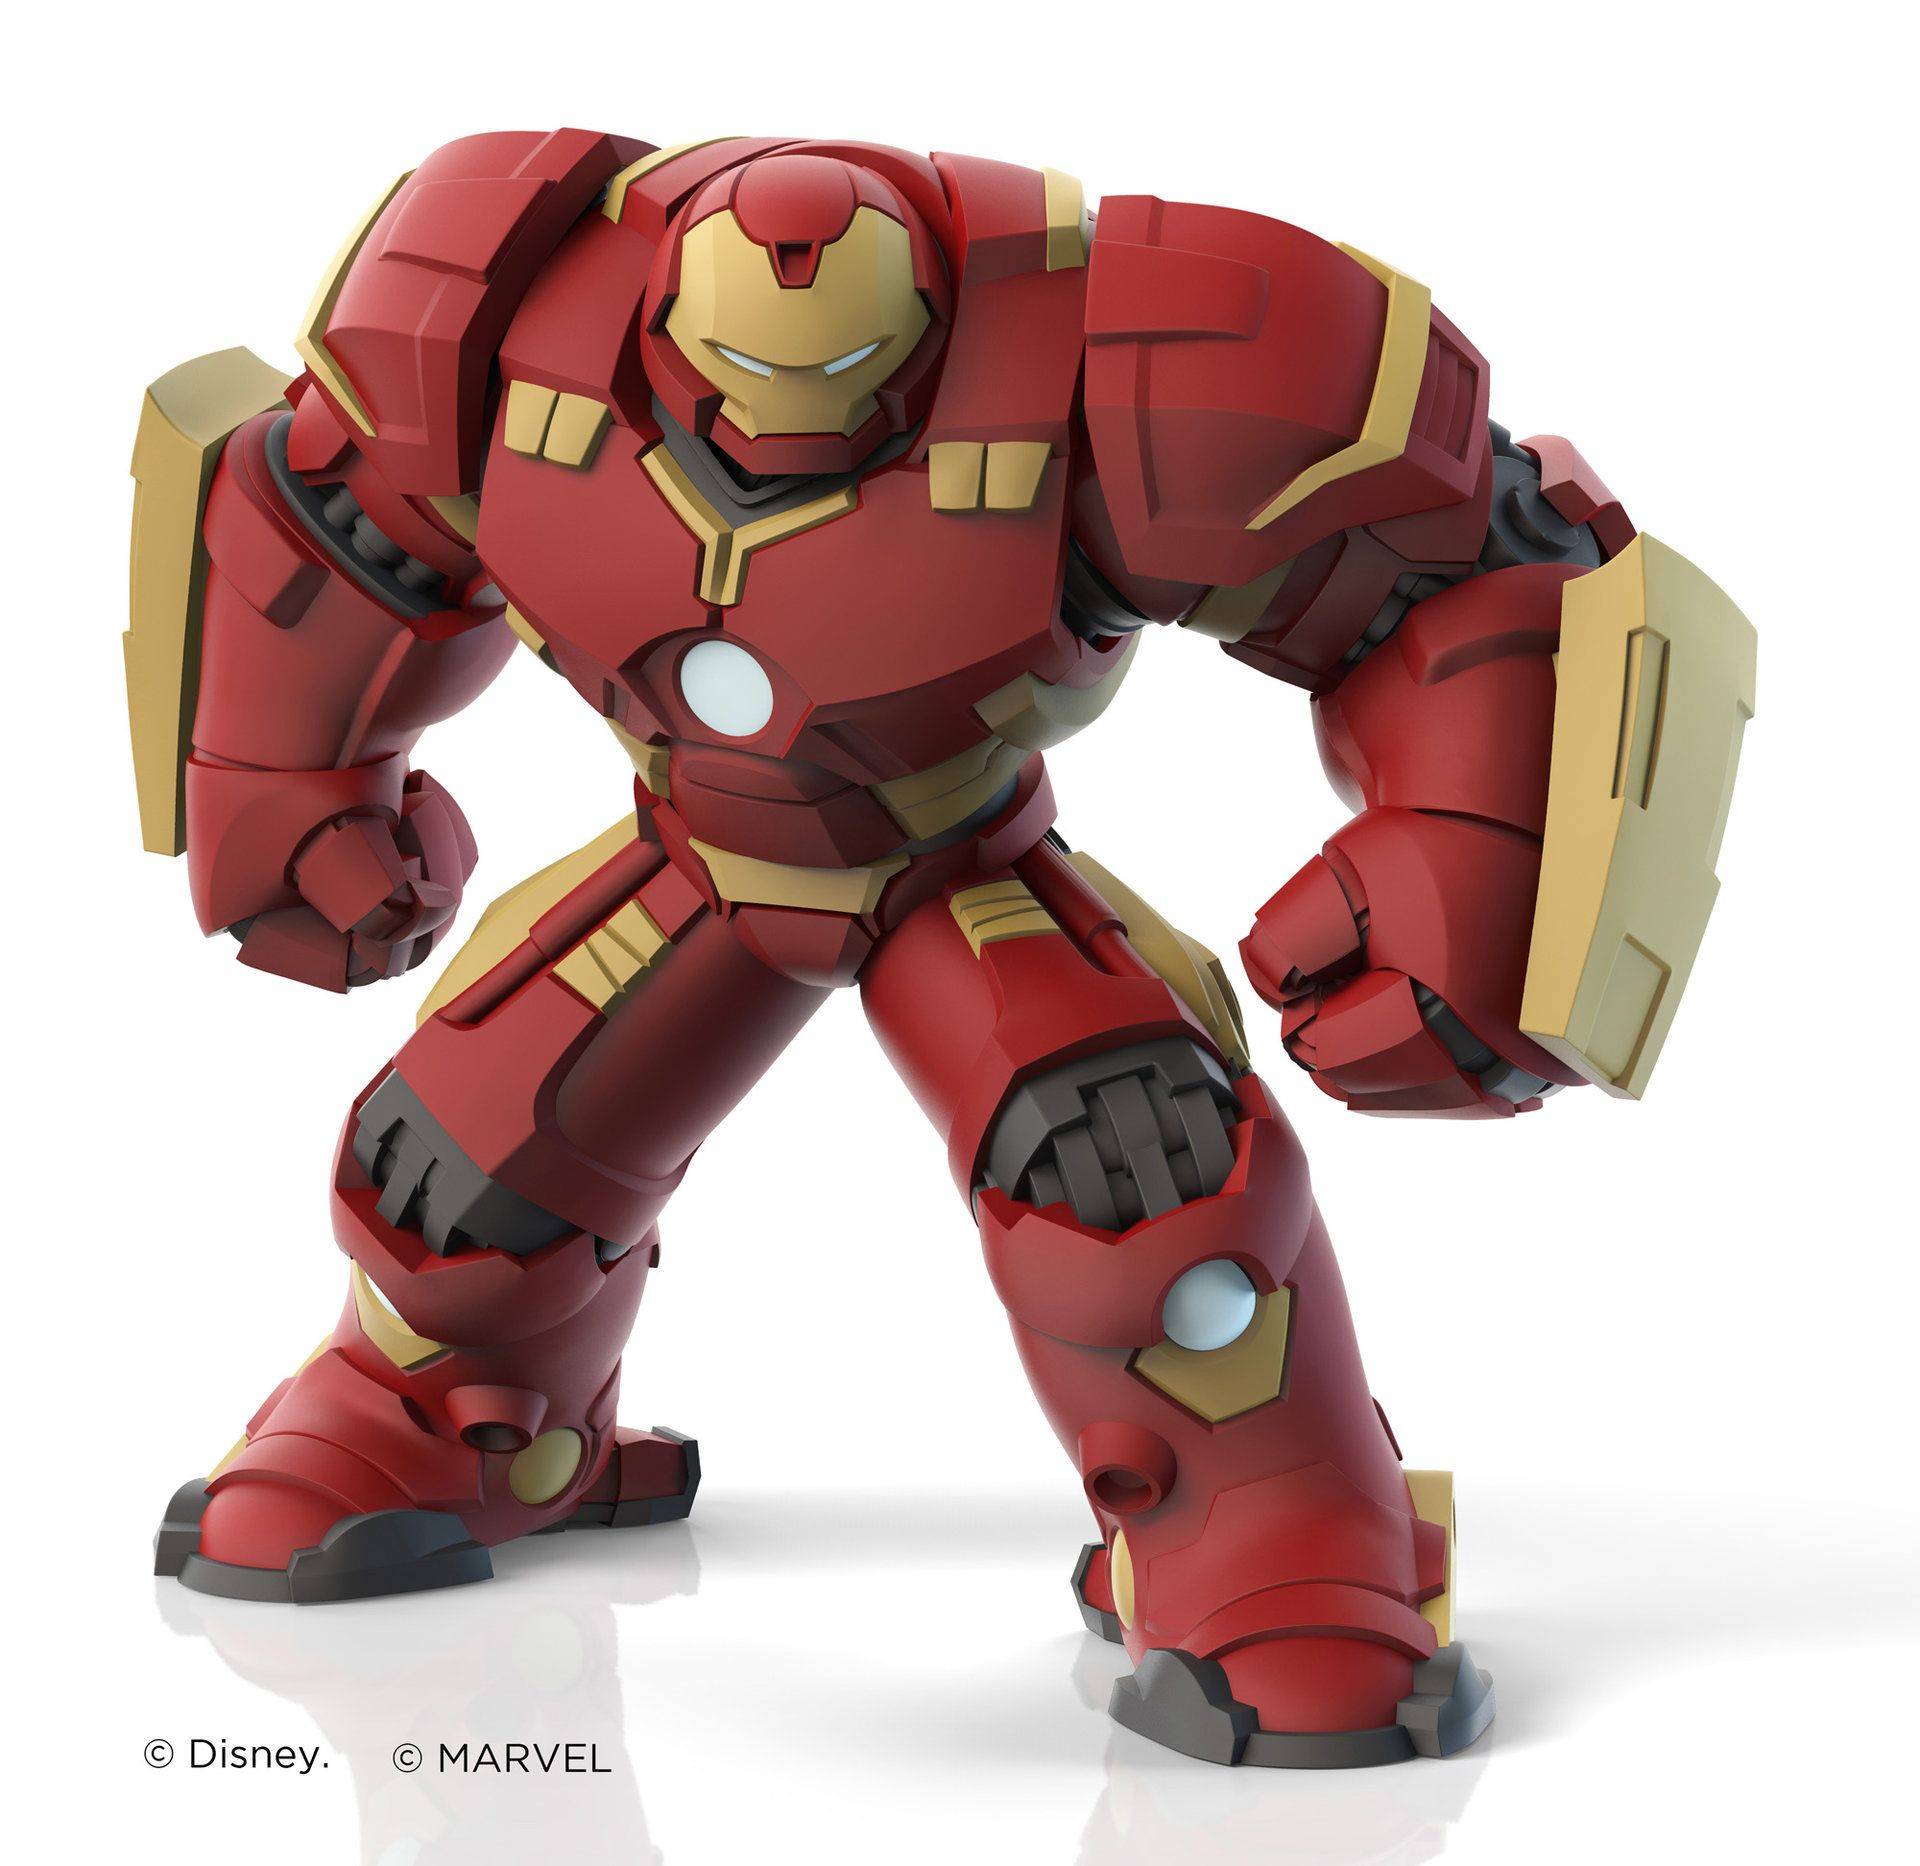 figurine disney infinity 3.0 hulk buster